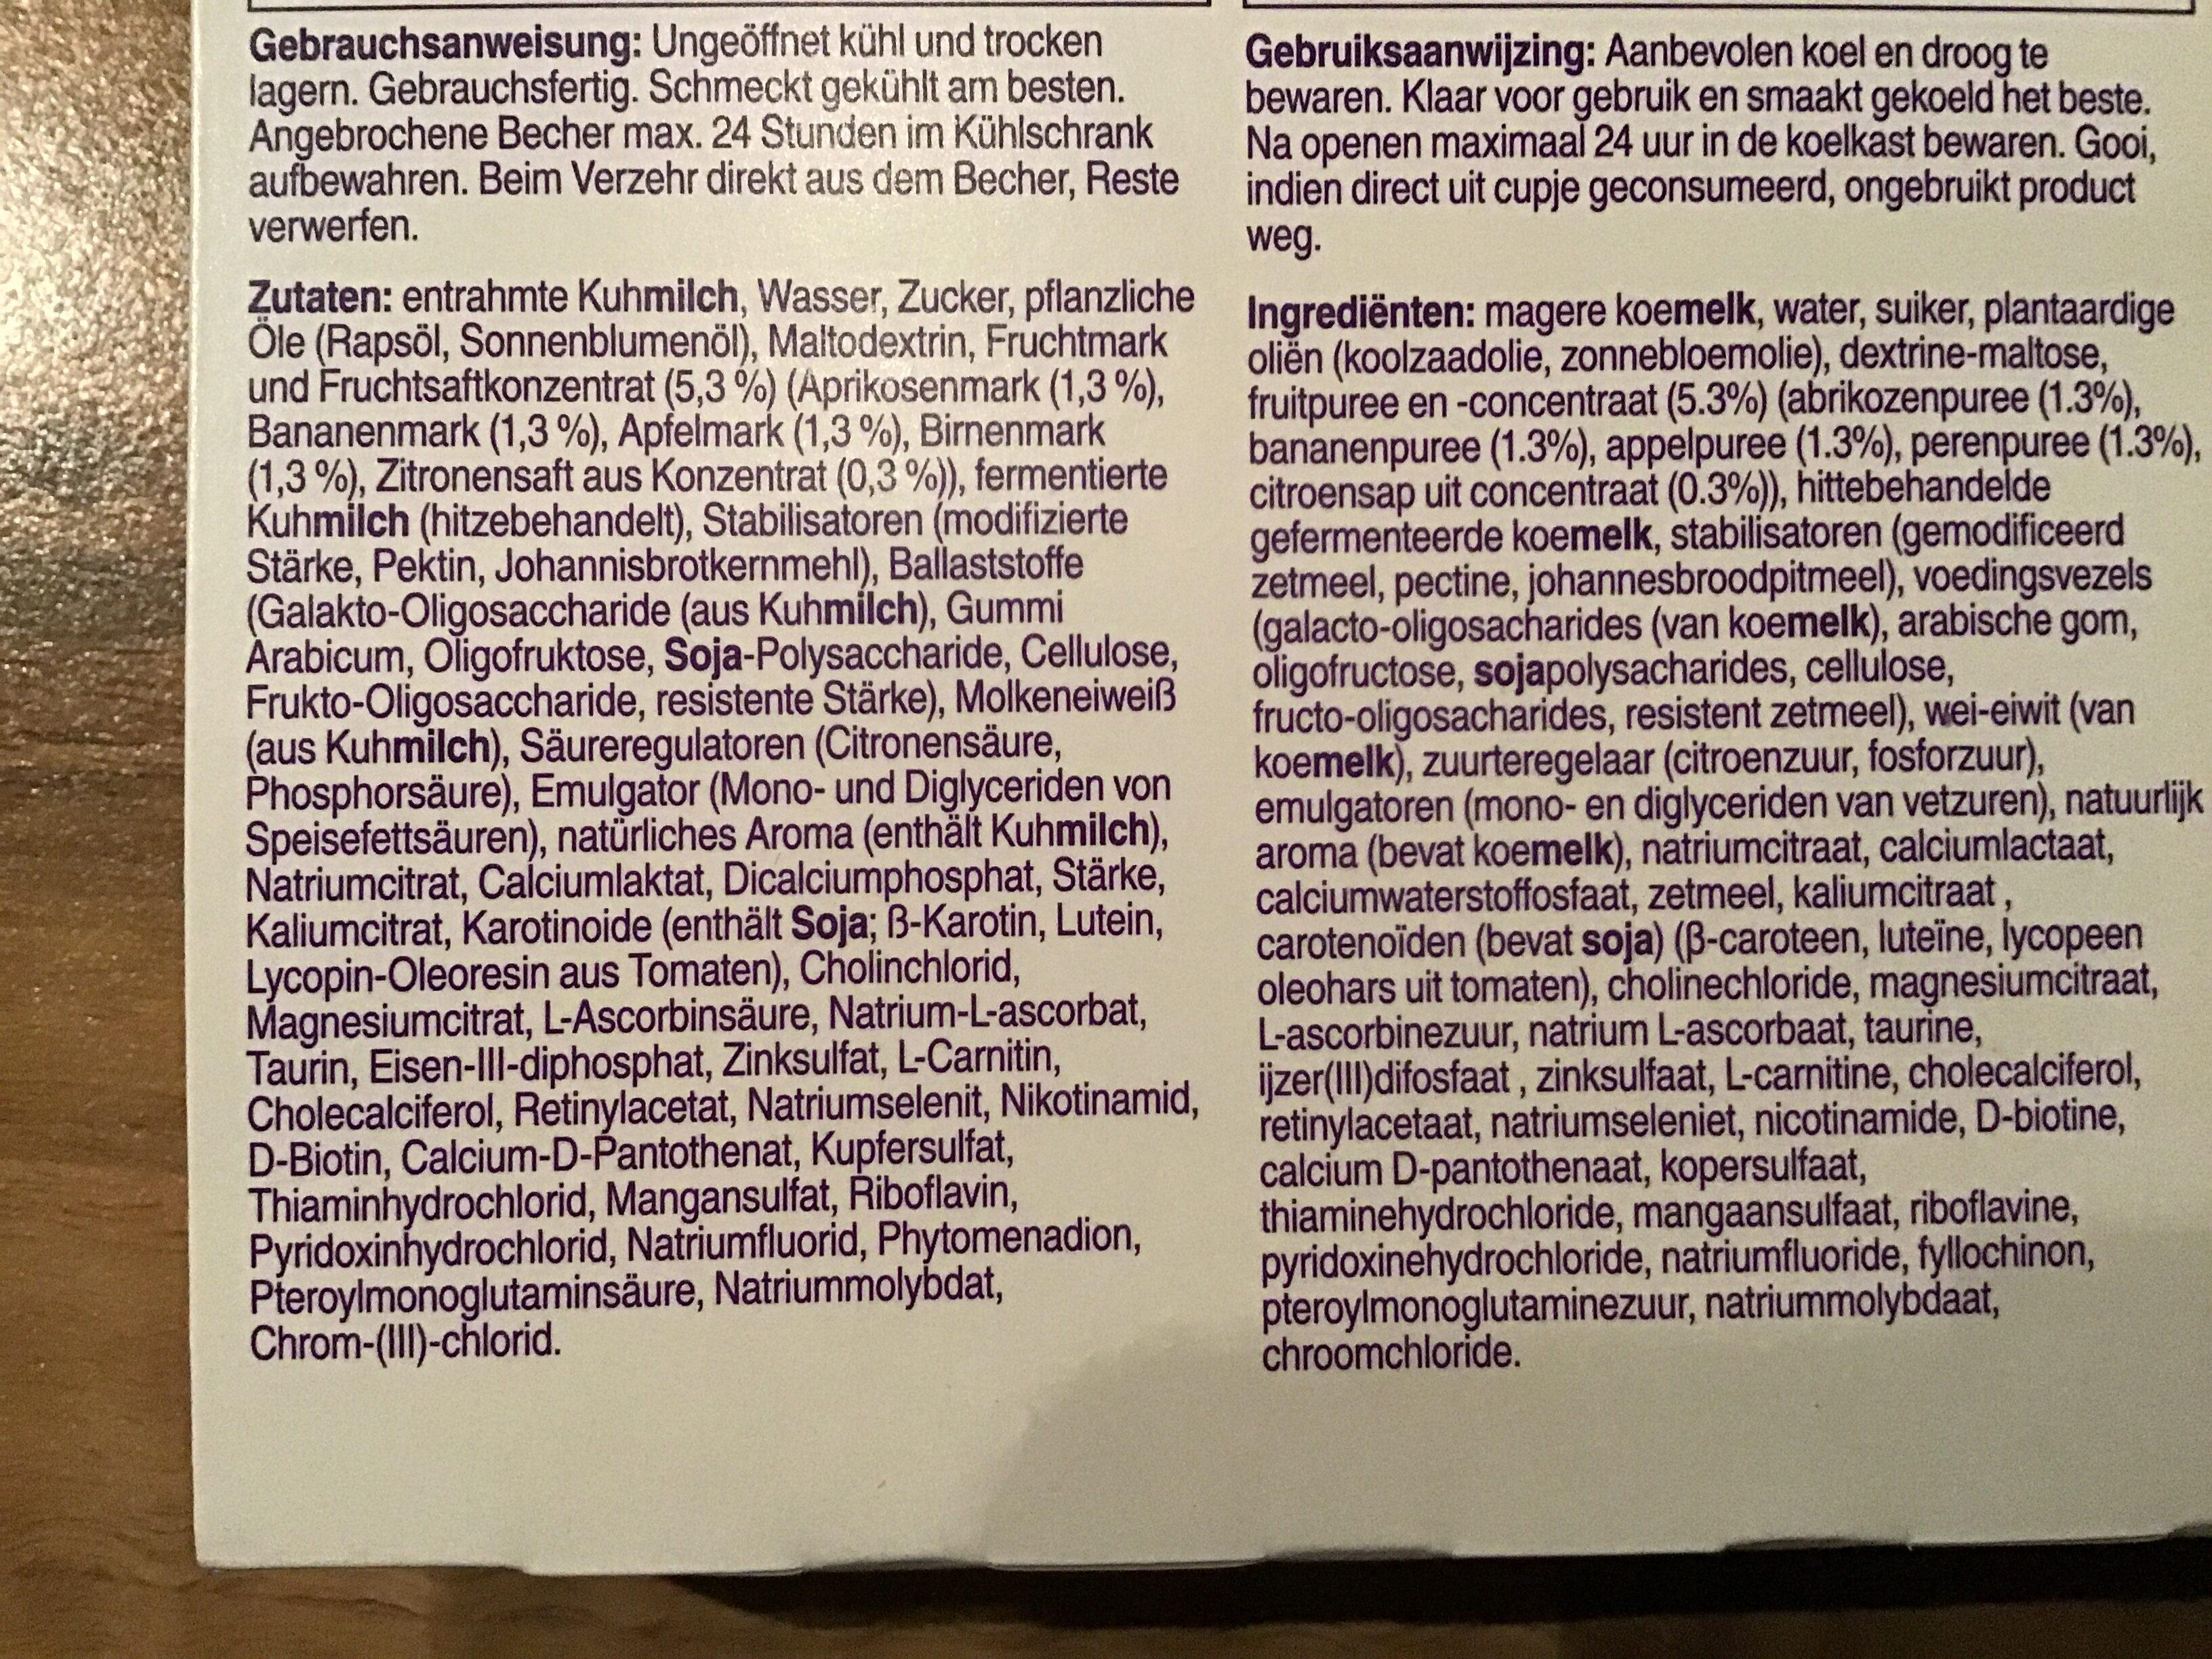 Nutricia NutriniCreamy Fruit - Inhaltsstoffe - de